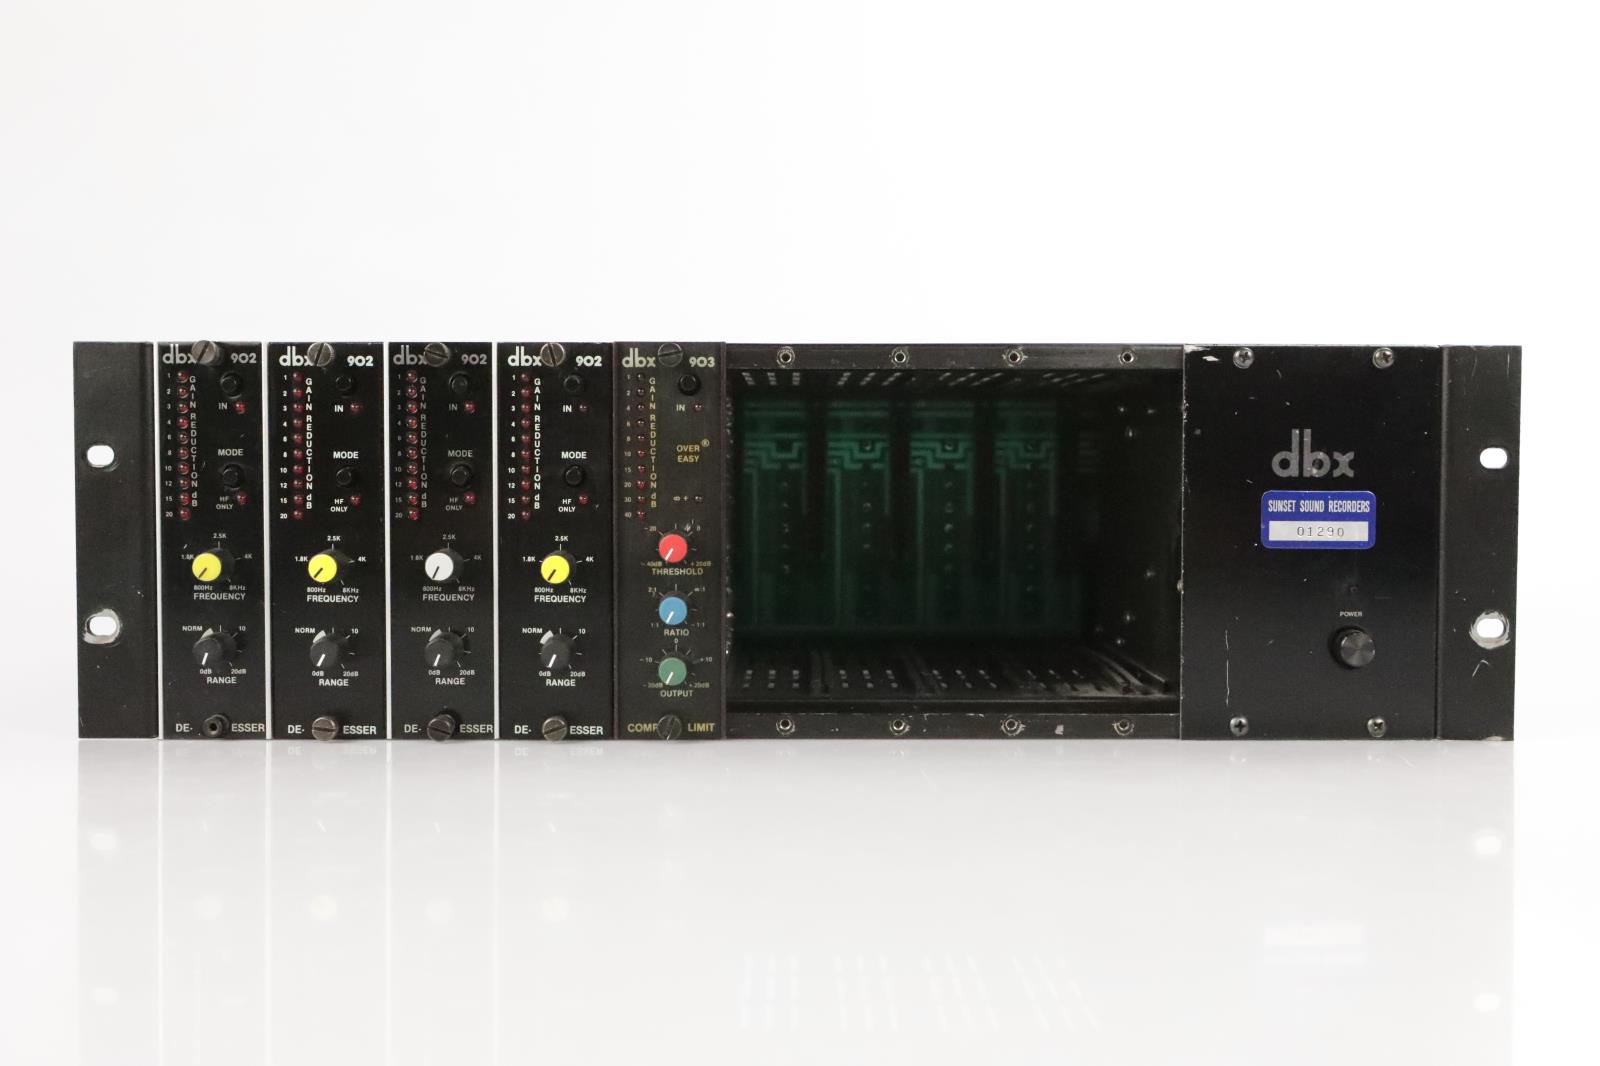 DBX 900 Series Frame Power Supply w/ 903 & 902 Modules Sunset Sound #34068